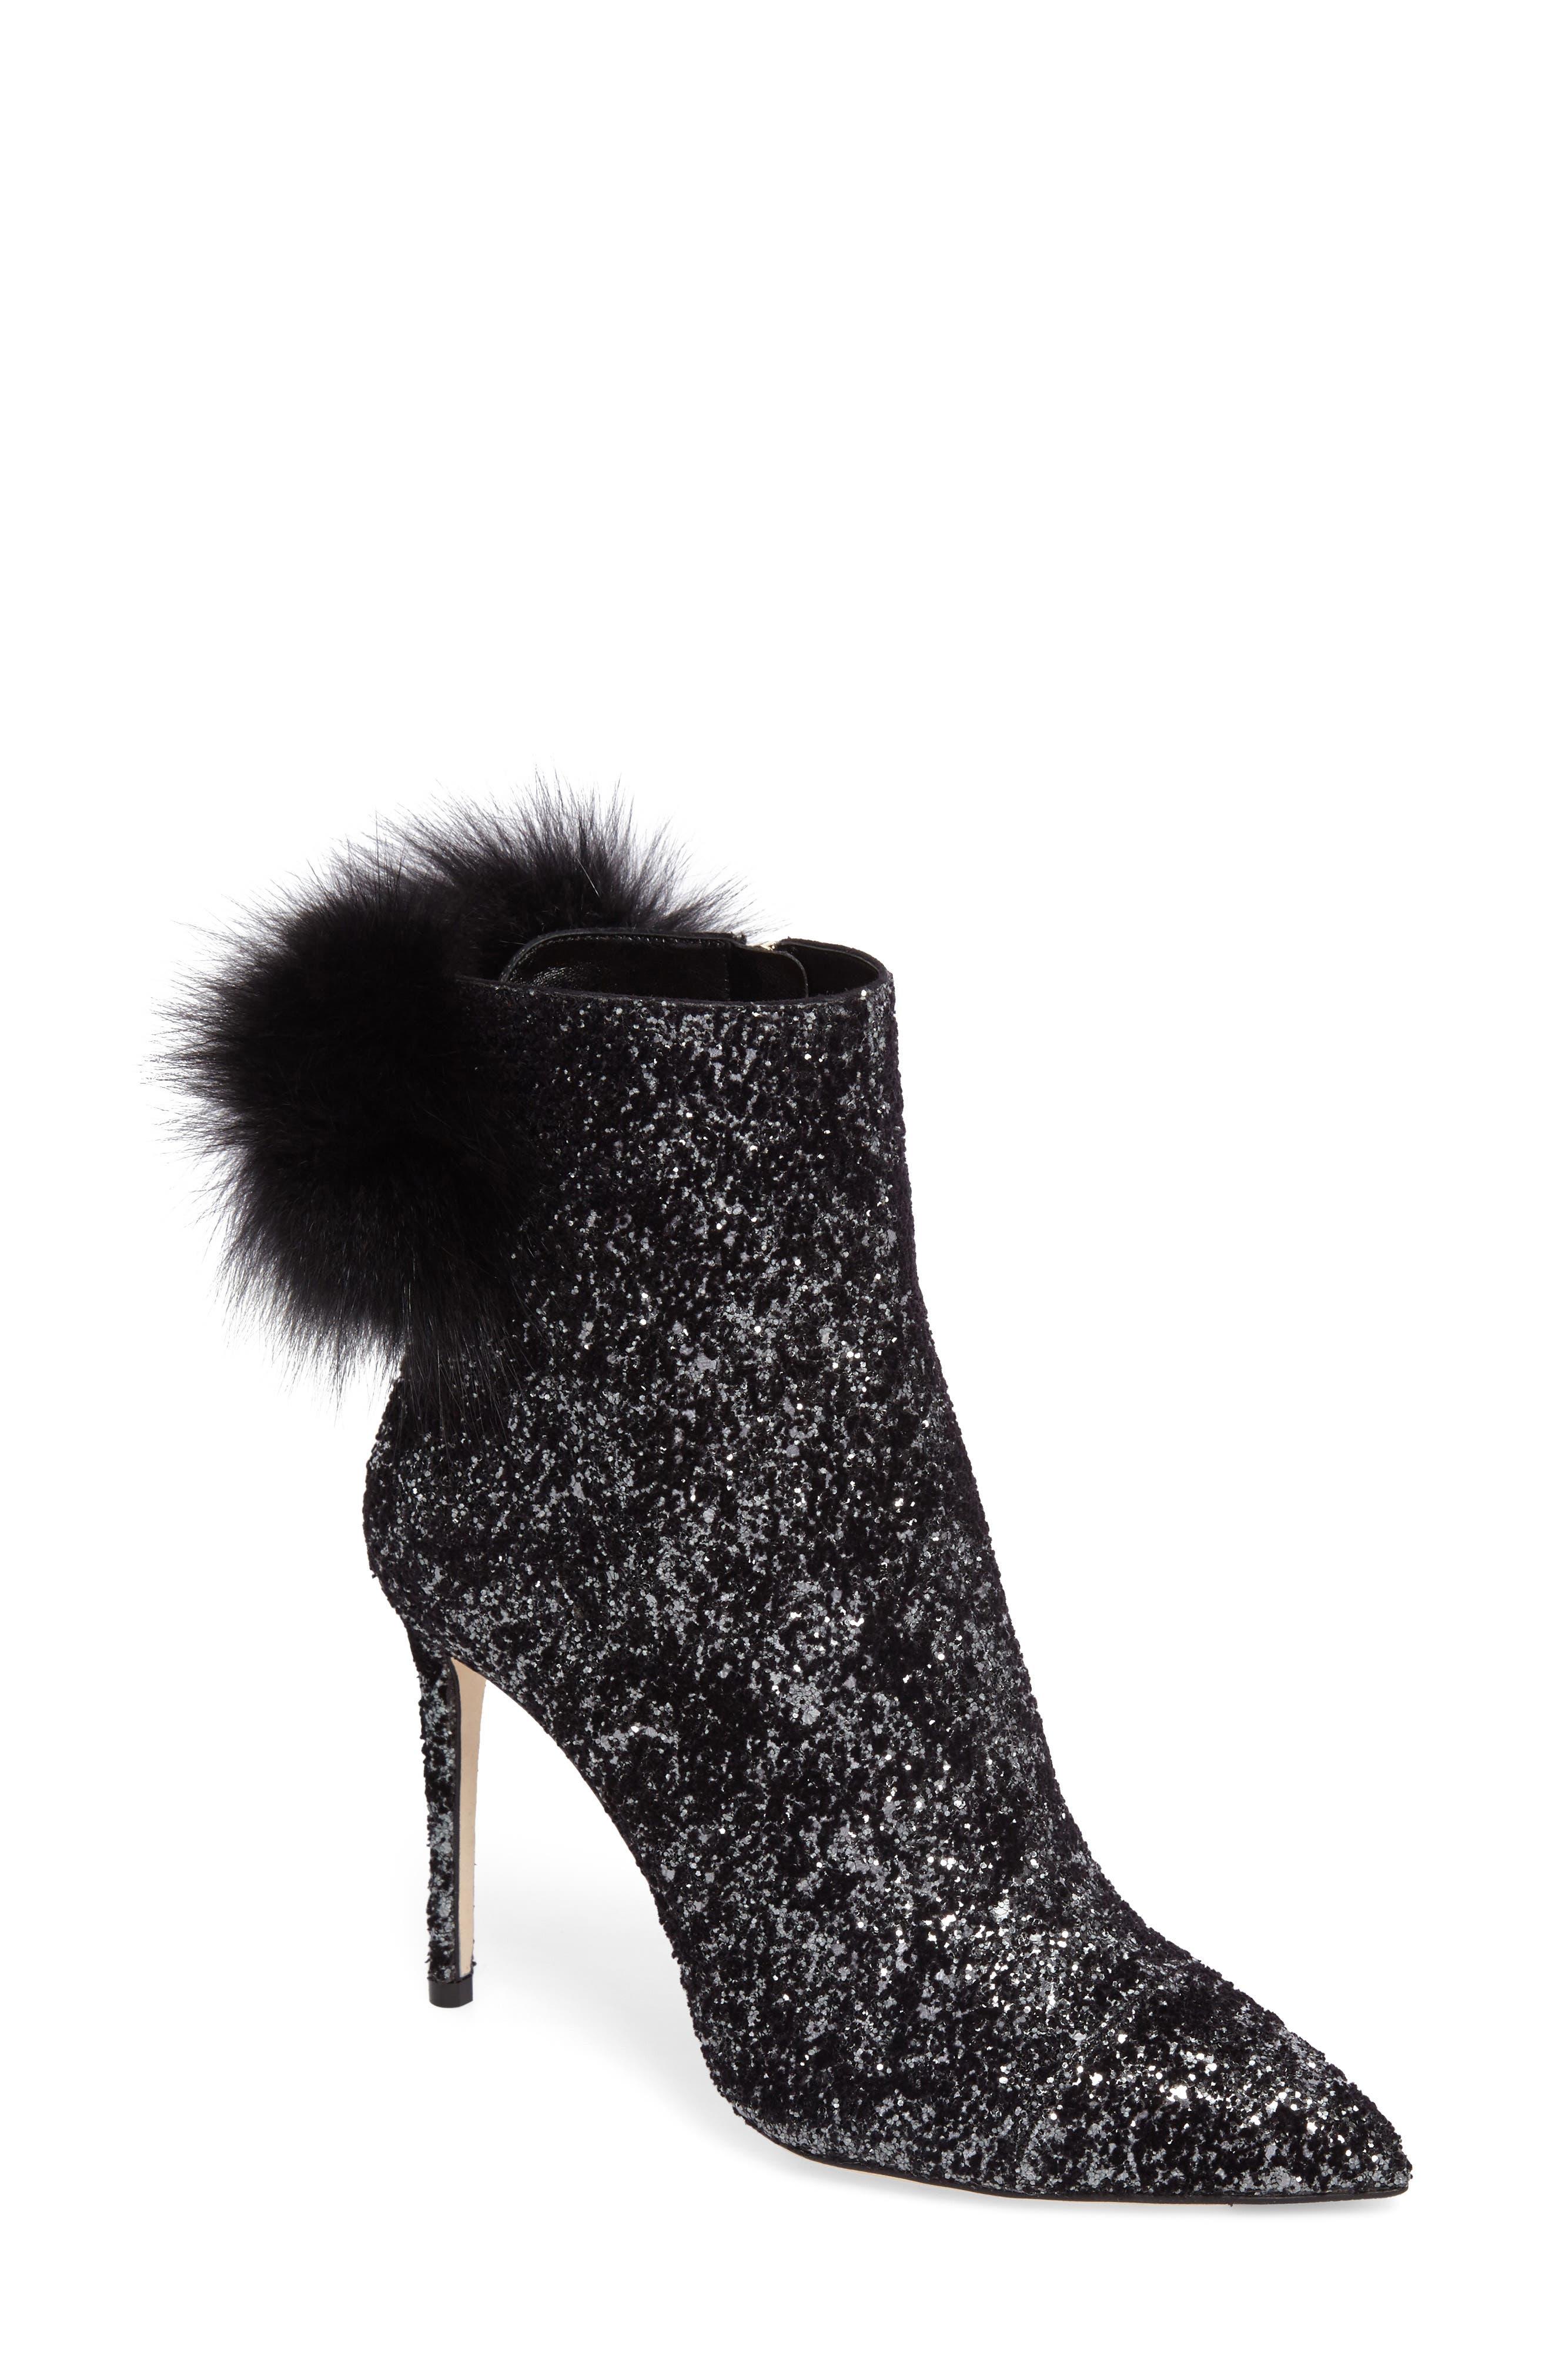 Tesler Genuine Fox Fur Bootie,                             Main thumbnail 1, color,                             Anthracite/ Black/ Black